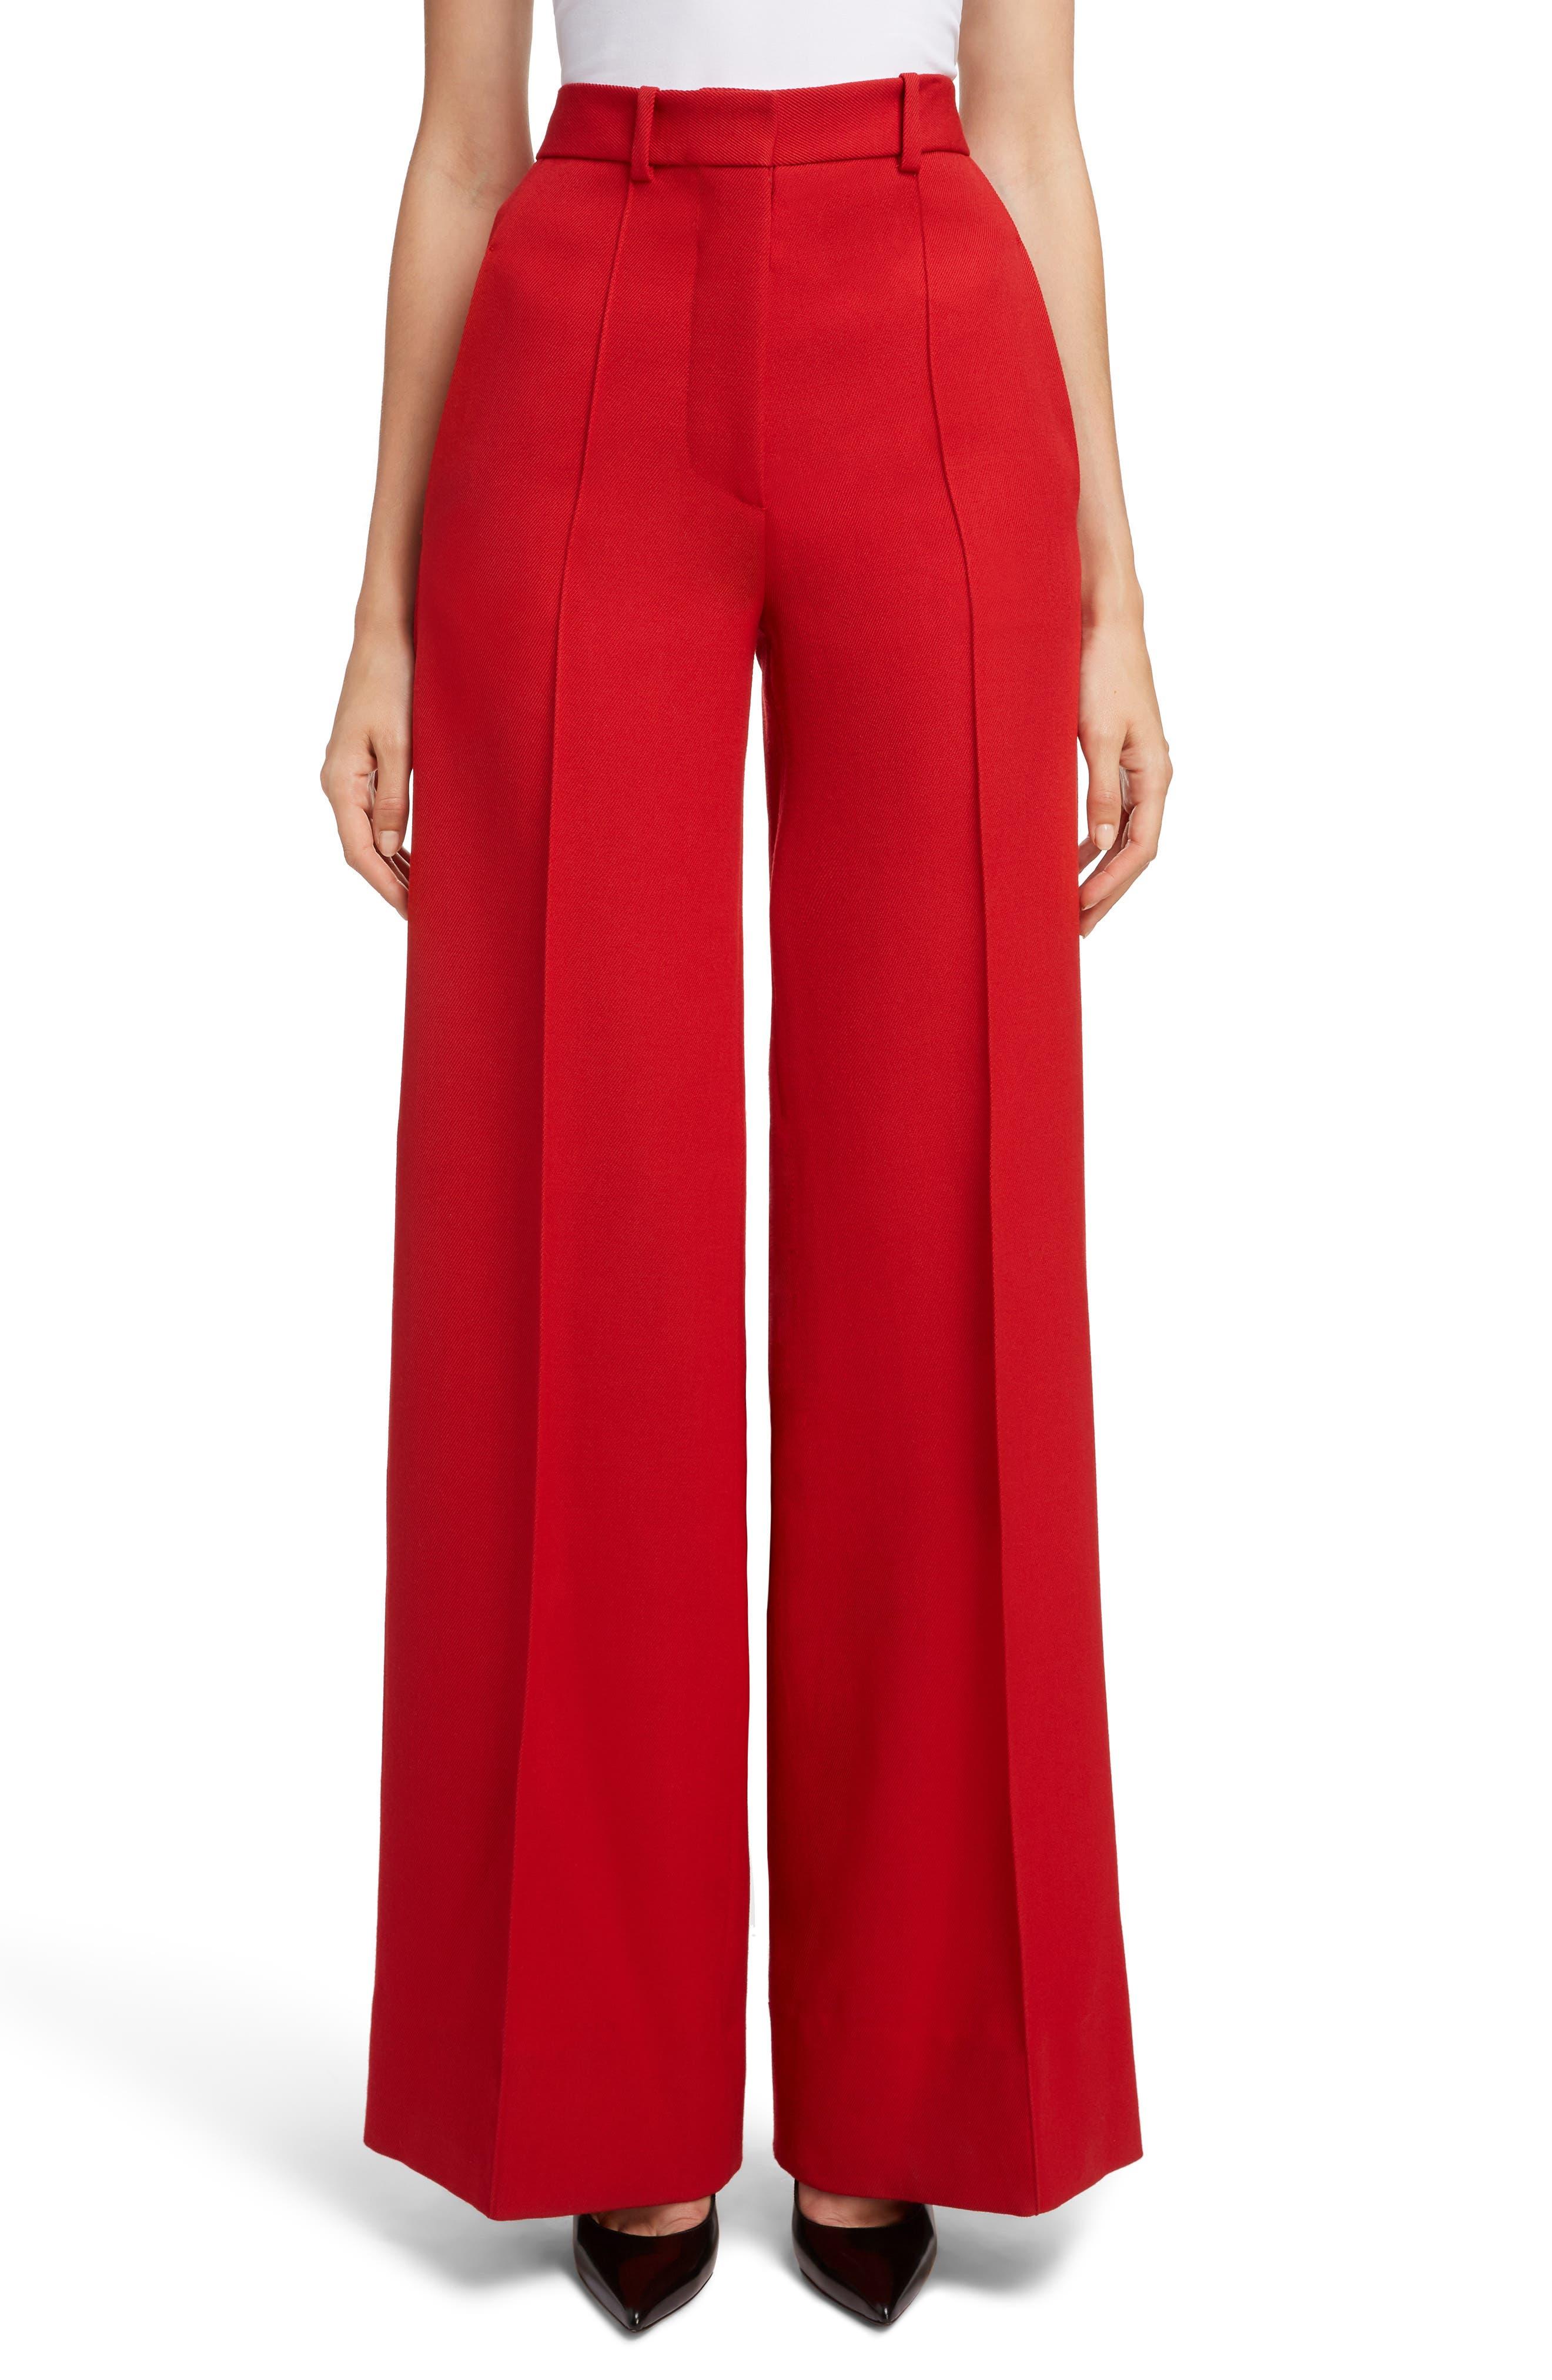 VICTORIA BECKHAM High Waist Wool Pants, Main, color, RED